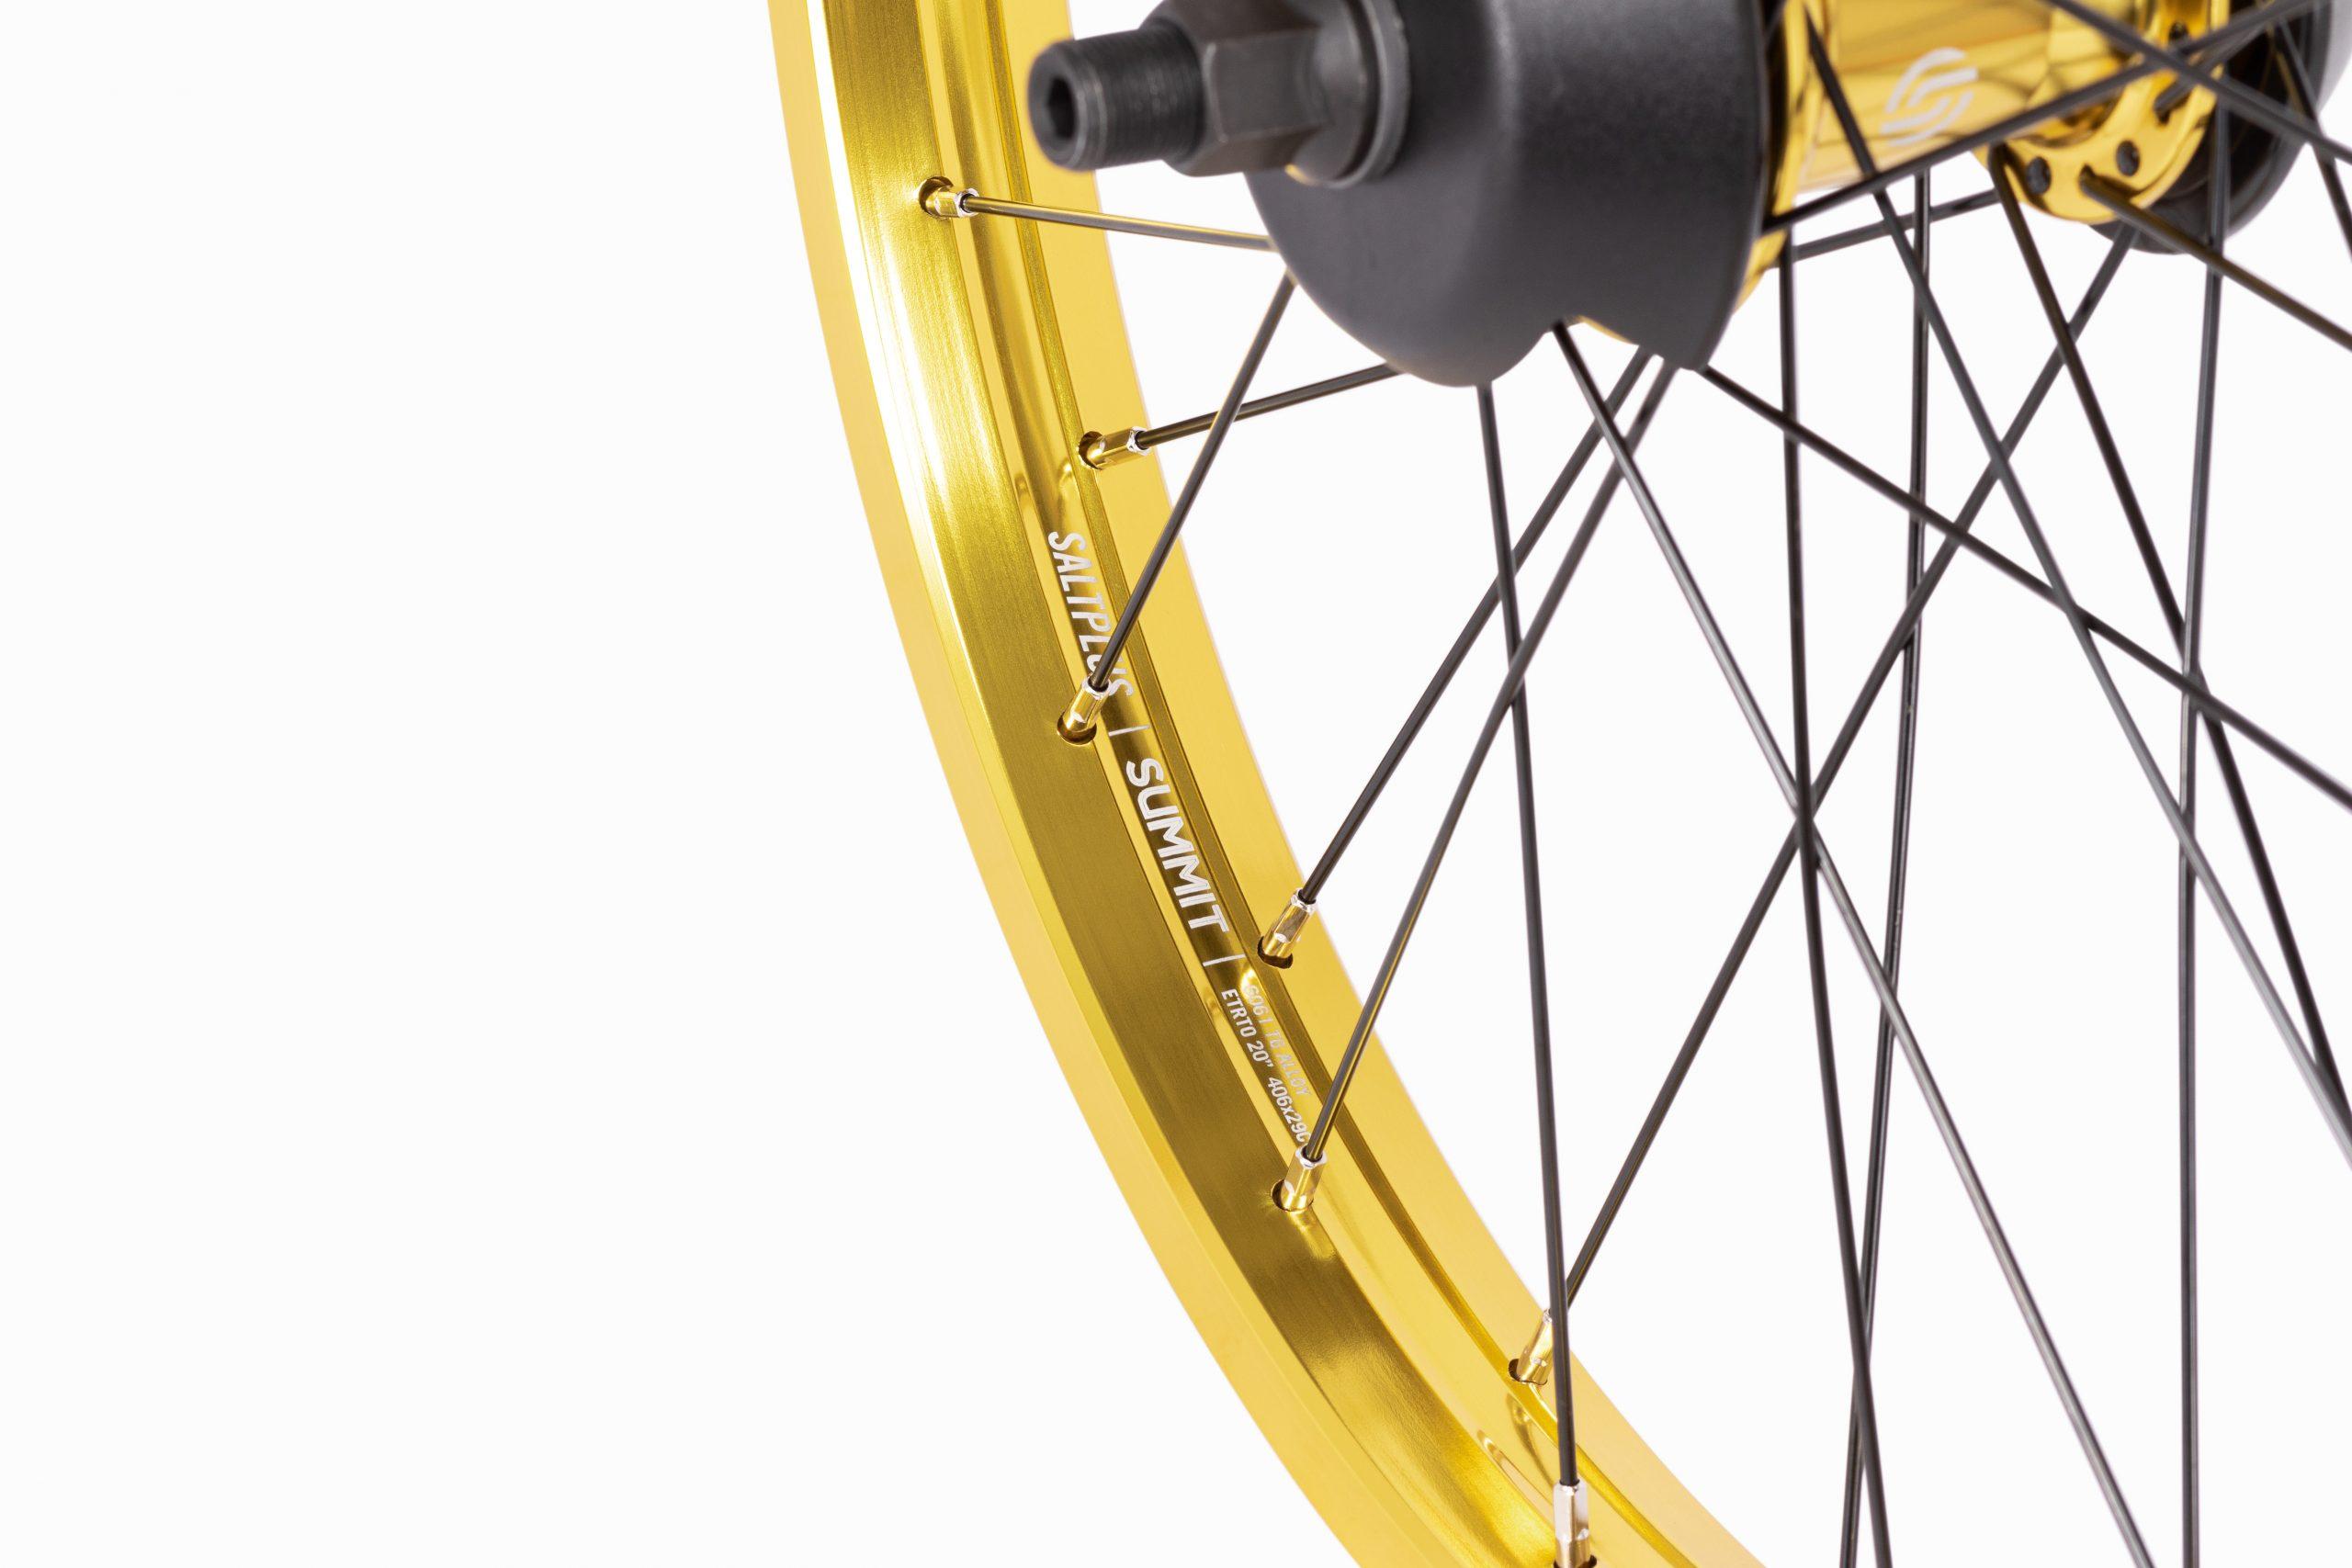 Salt_Everest_FC_rear_wheel_gold-05